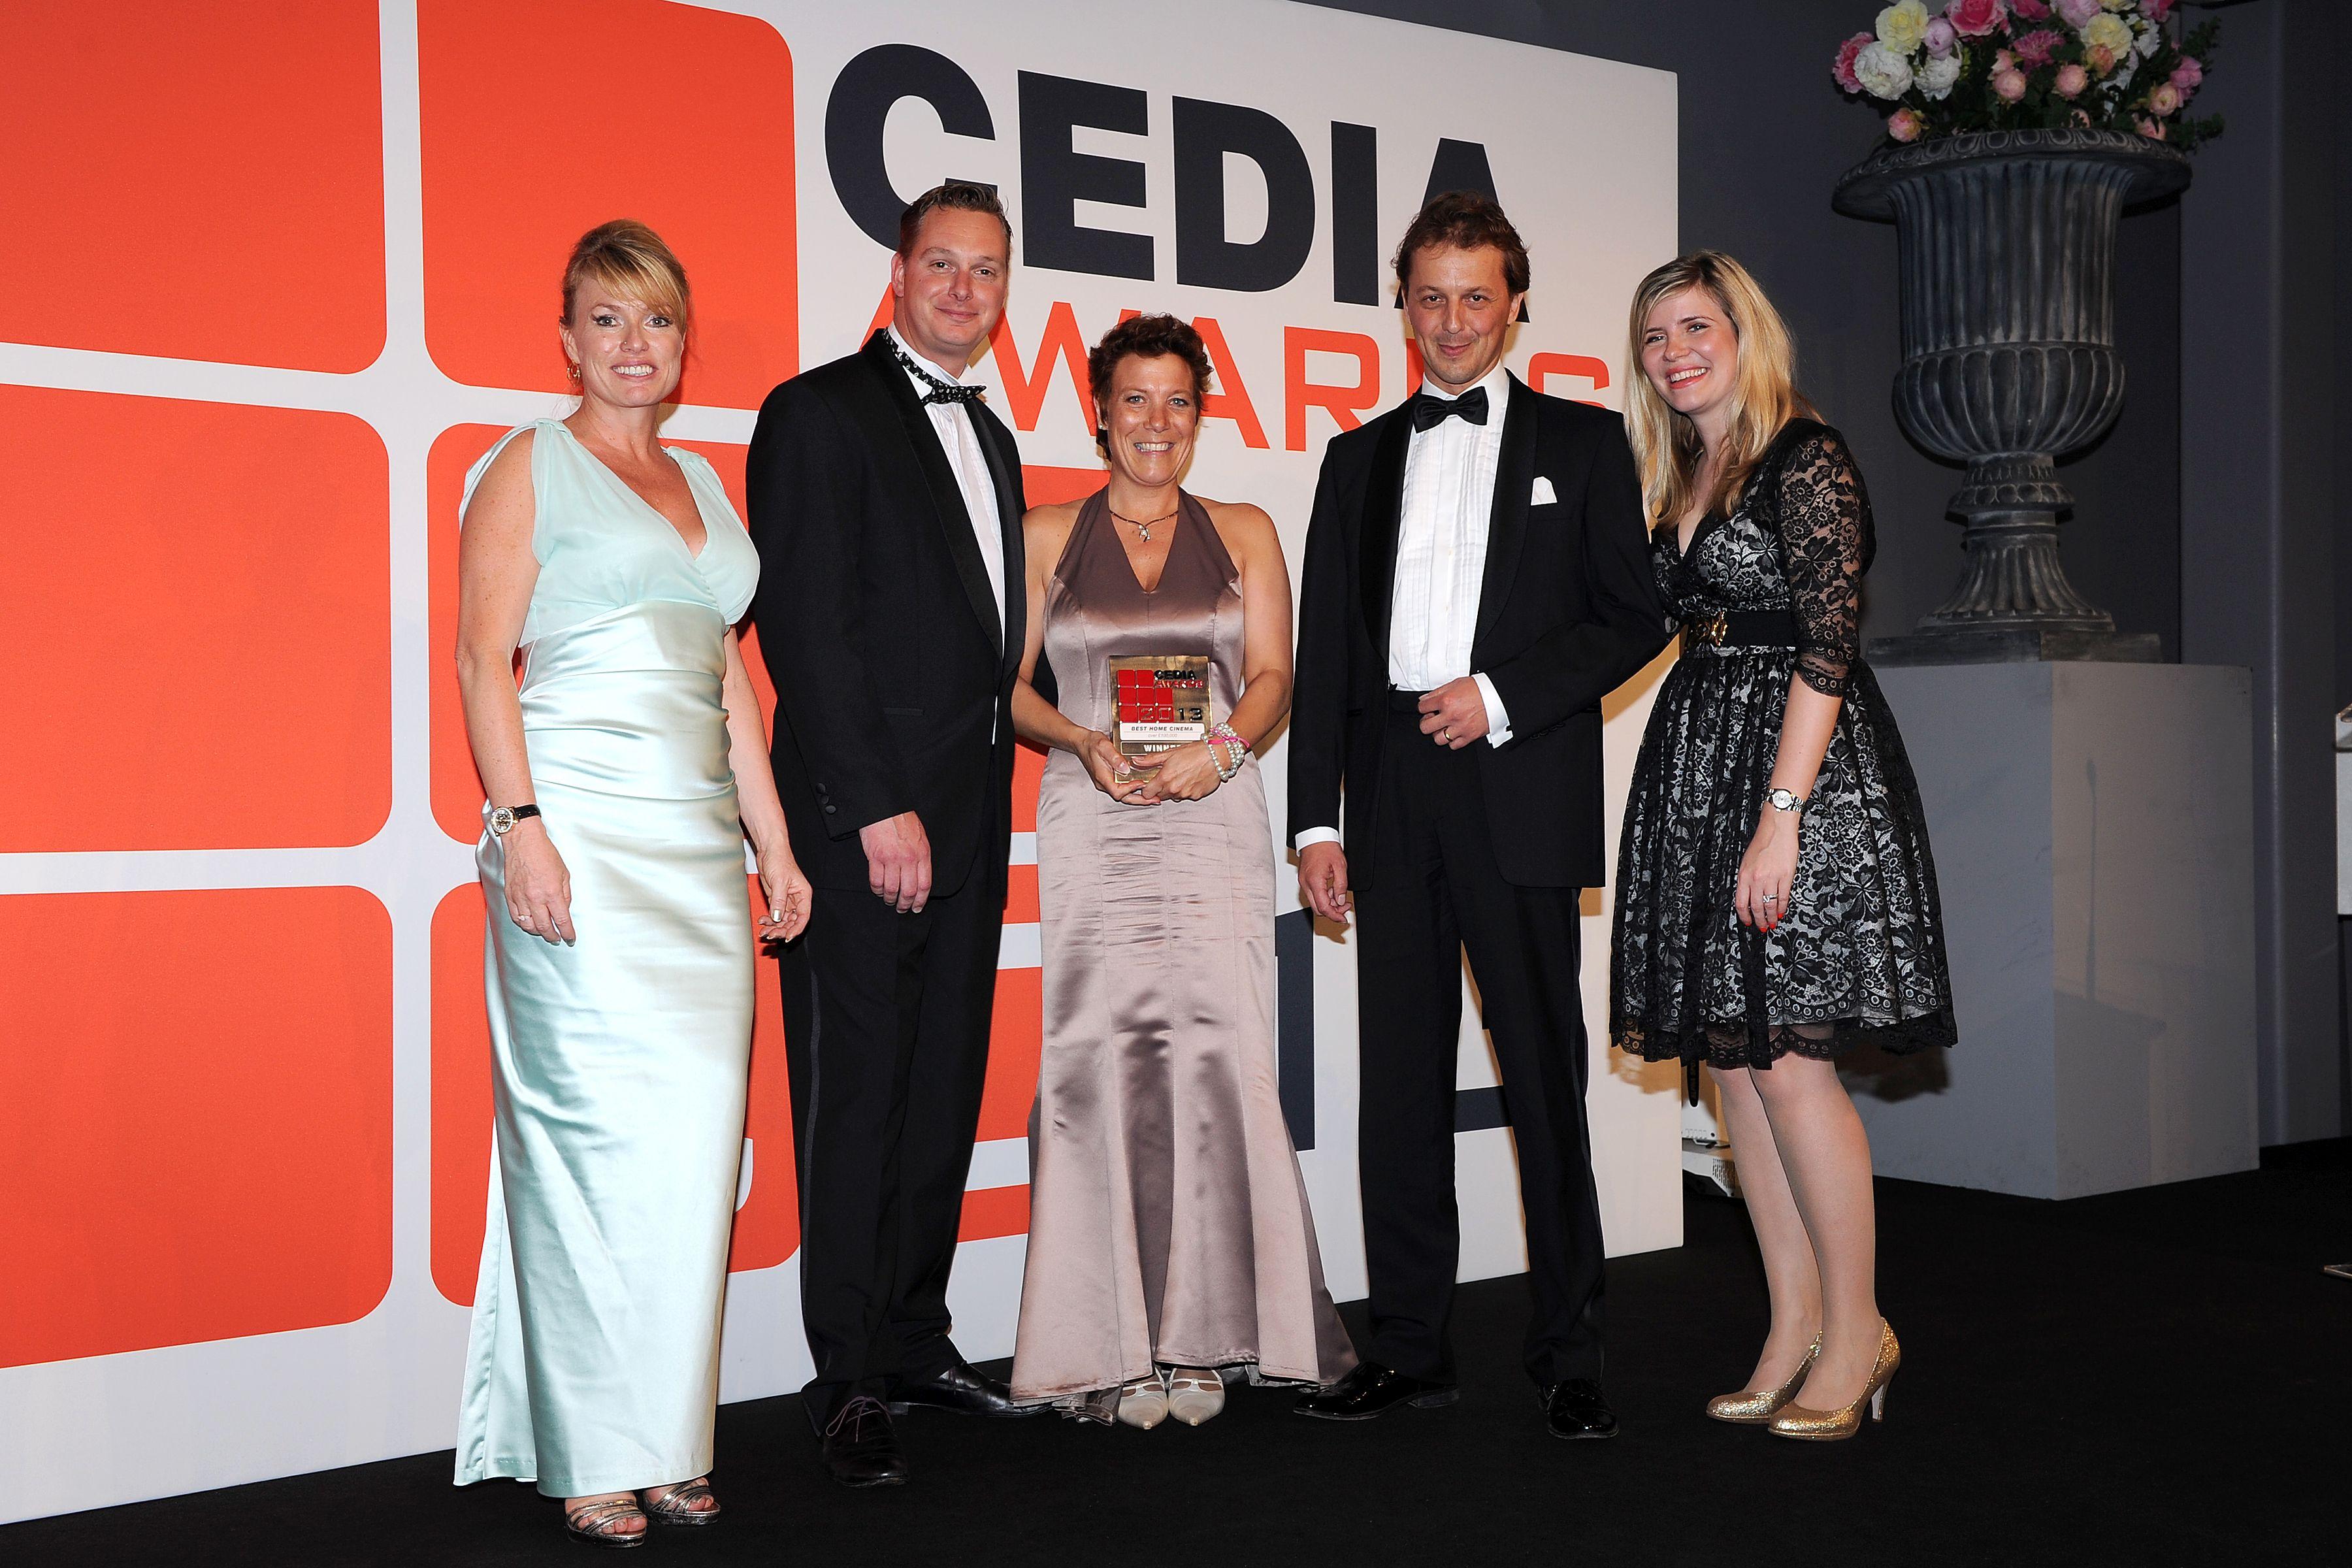 Cedia awards de opera domotica joint winner best home